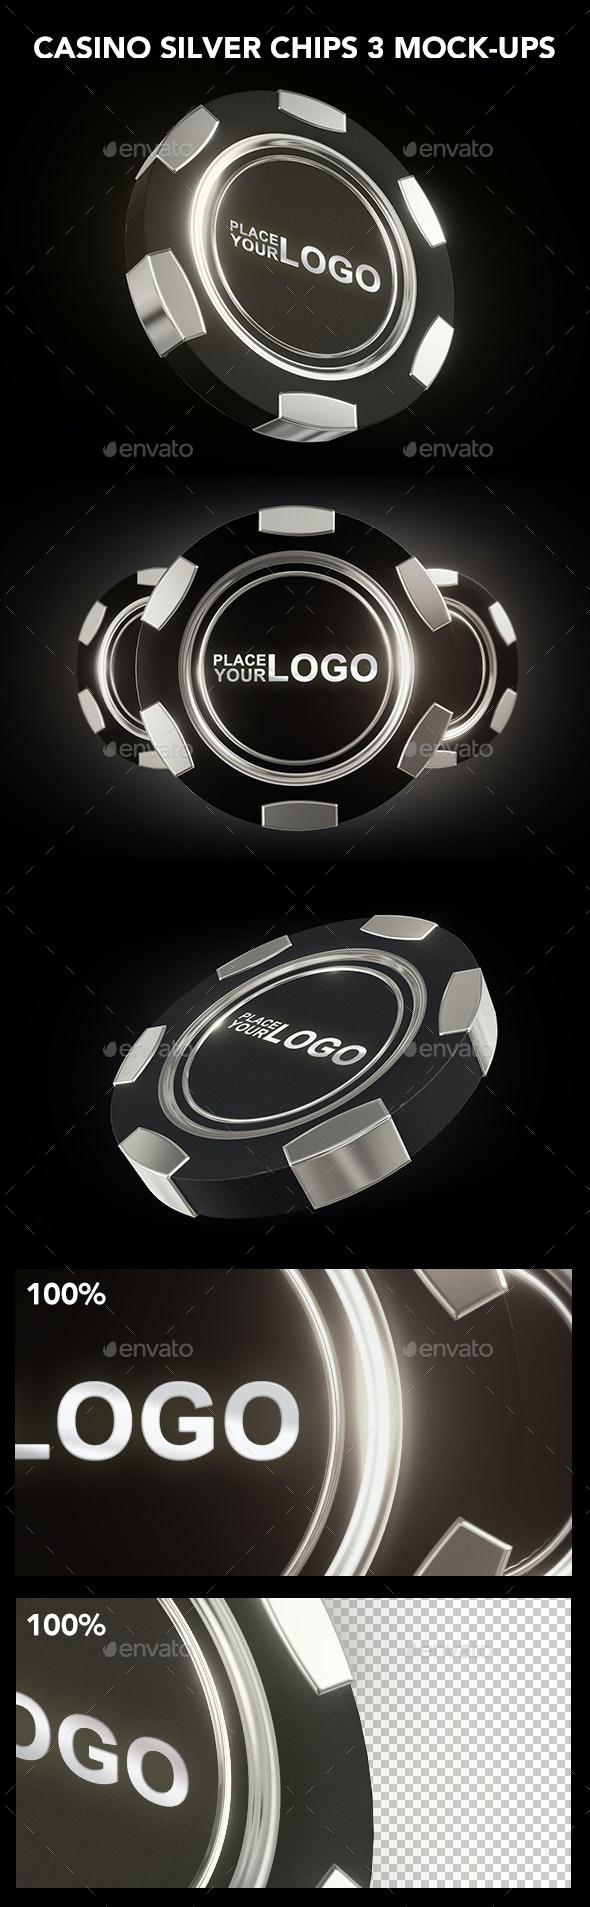 Casino Silver Chip Mockup - Product Mock-Ups Graphics